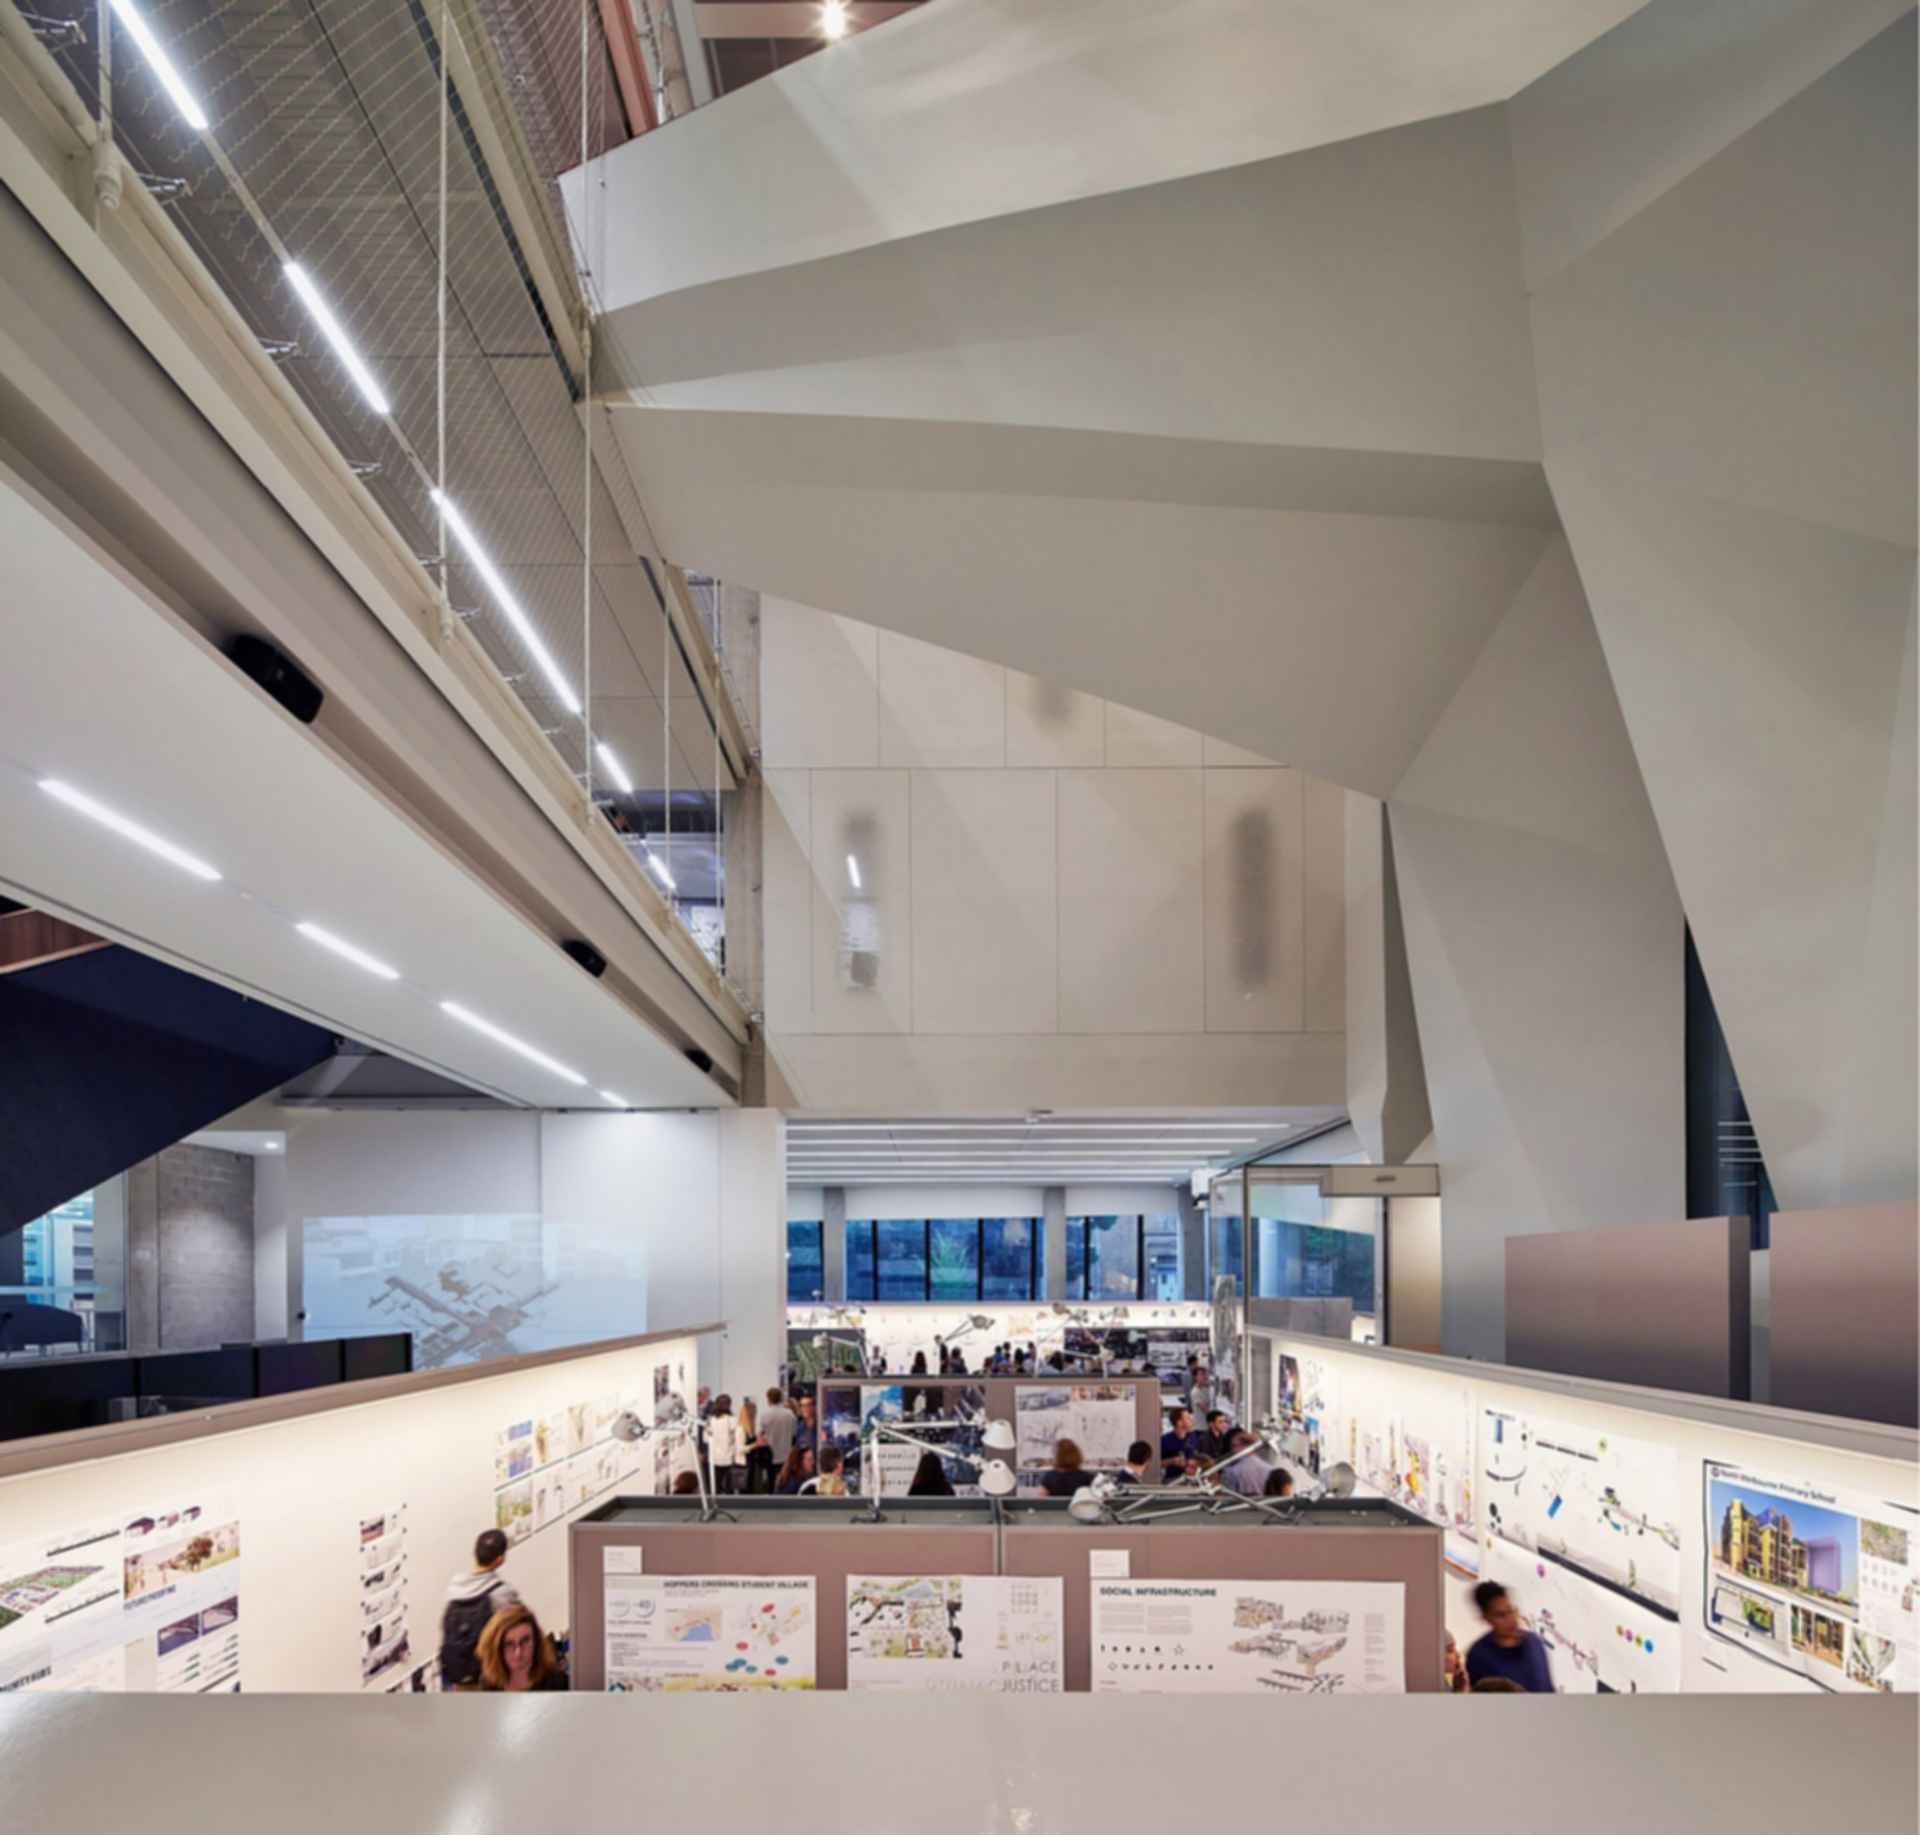 Melbourne School of Design - University of Melbourne - Interior